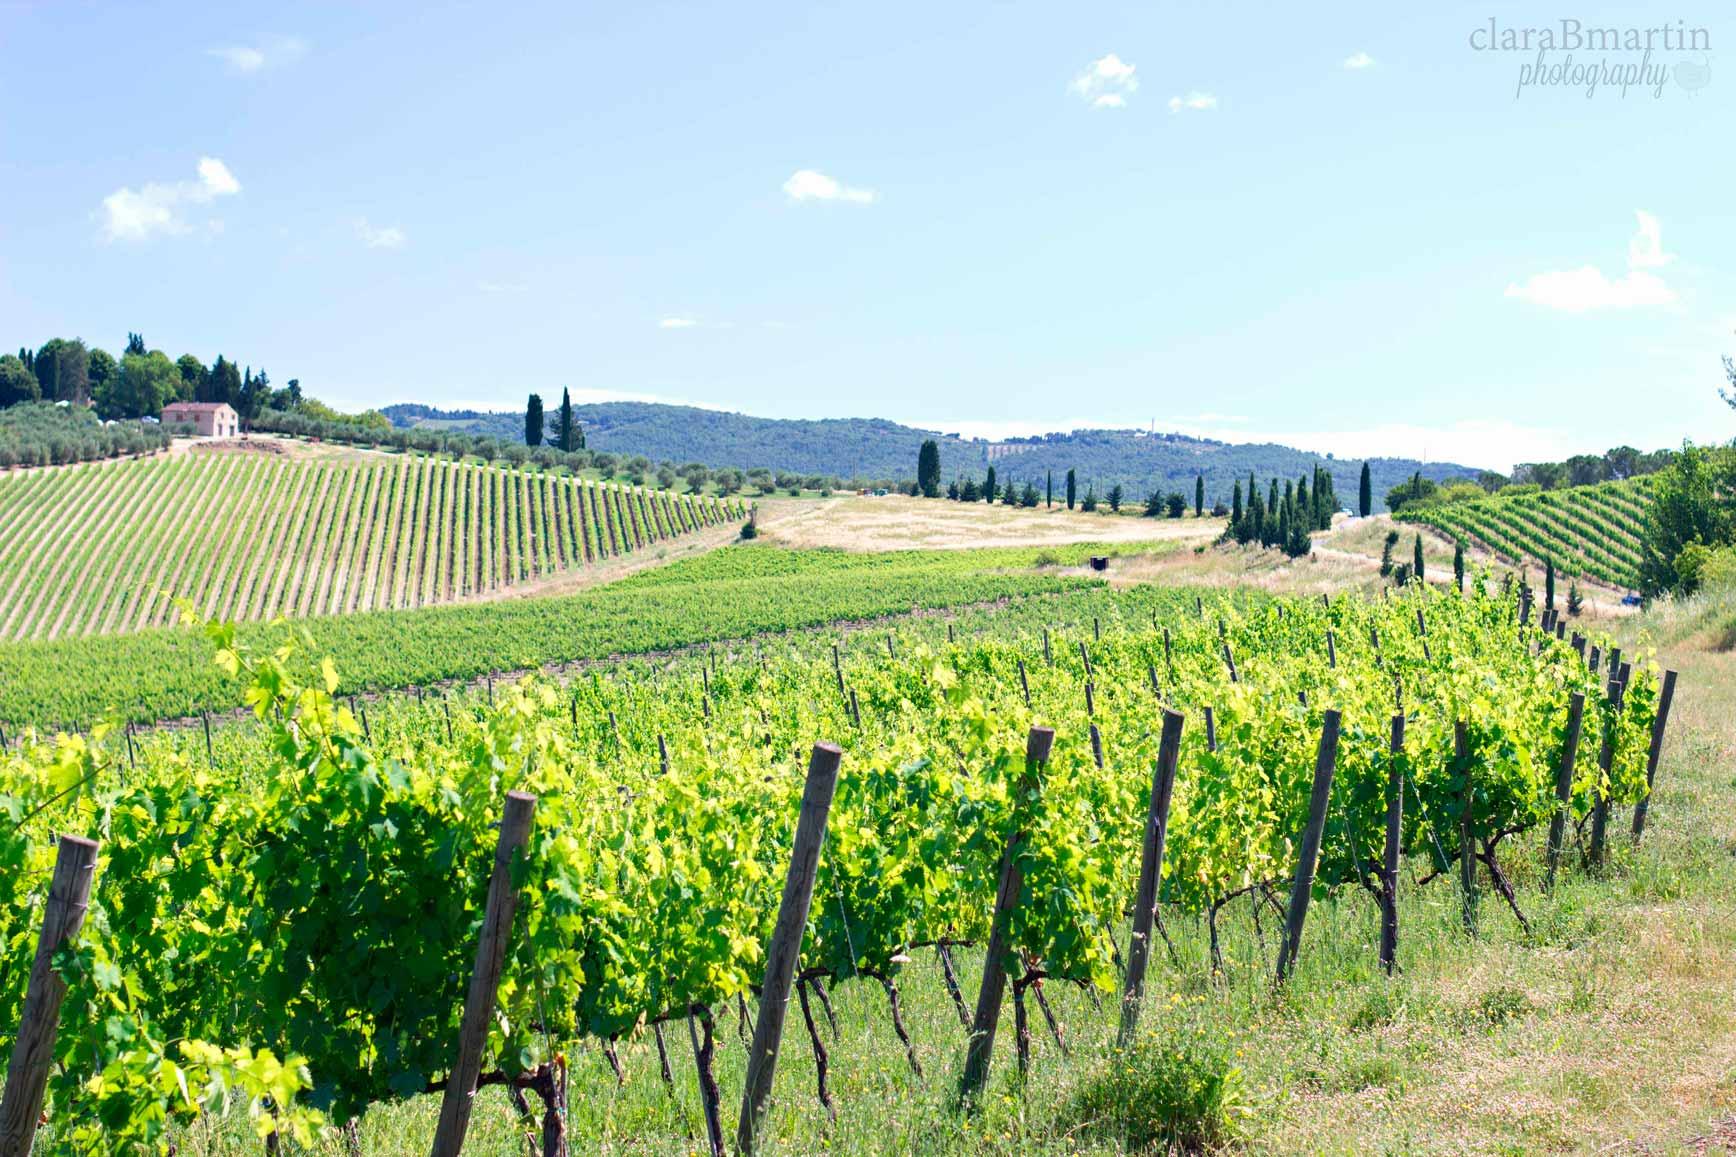 ToscanaclaraBmartin_04